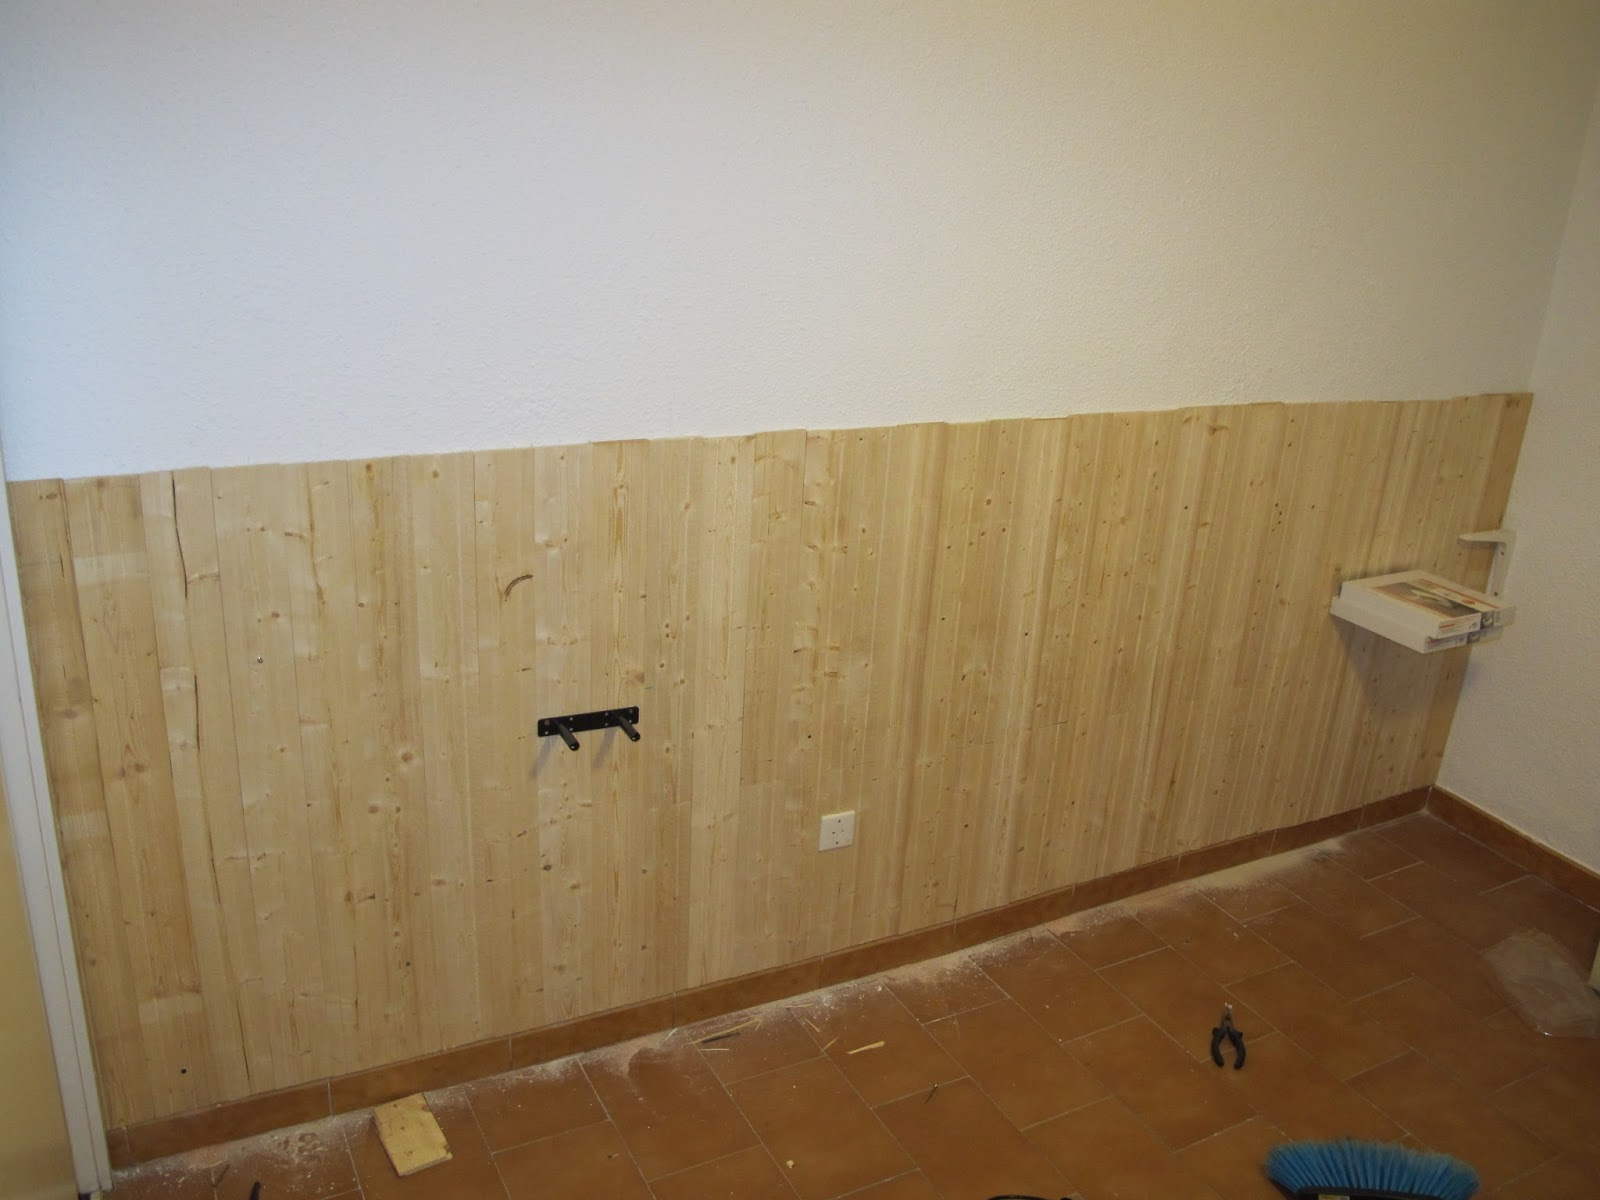 Bricomonxo cabecero de madera para dormitorio - Zocalo pared ...